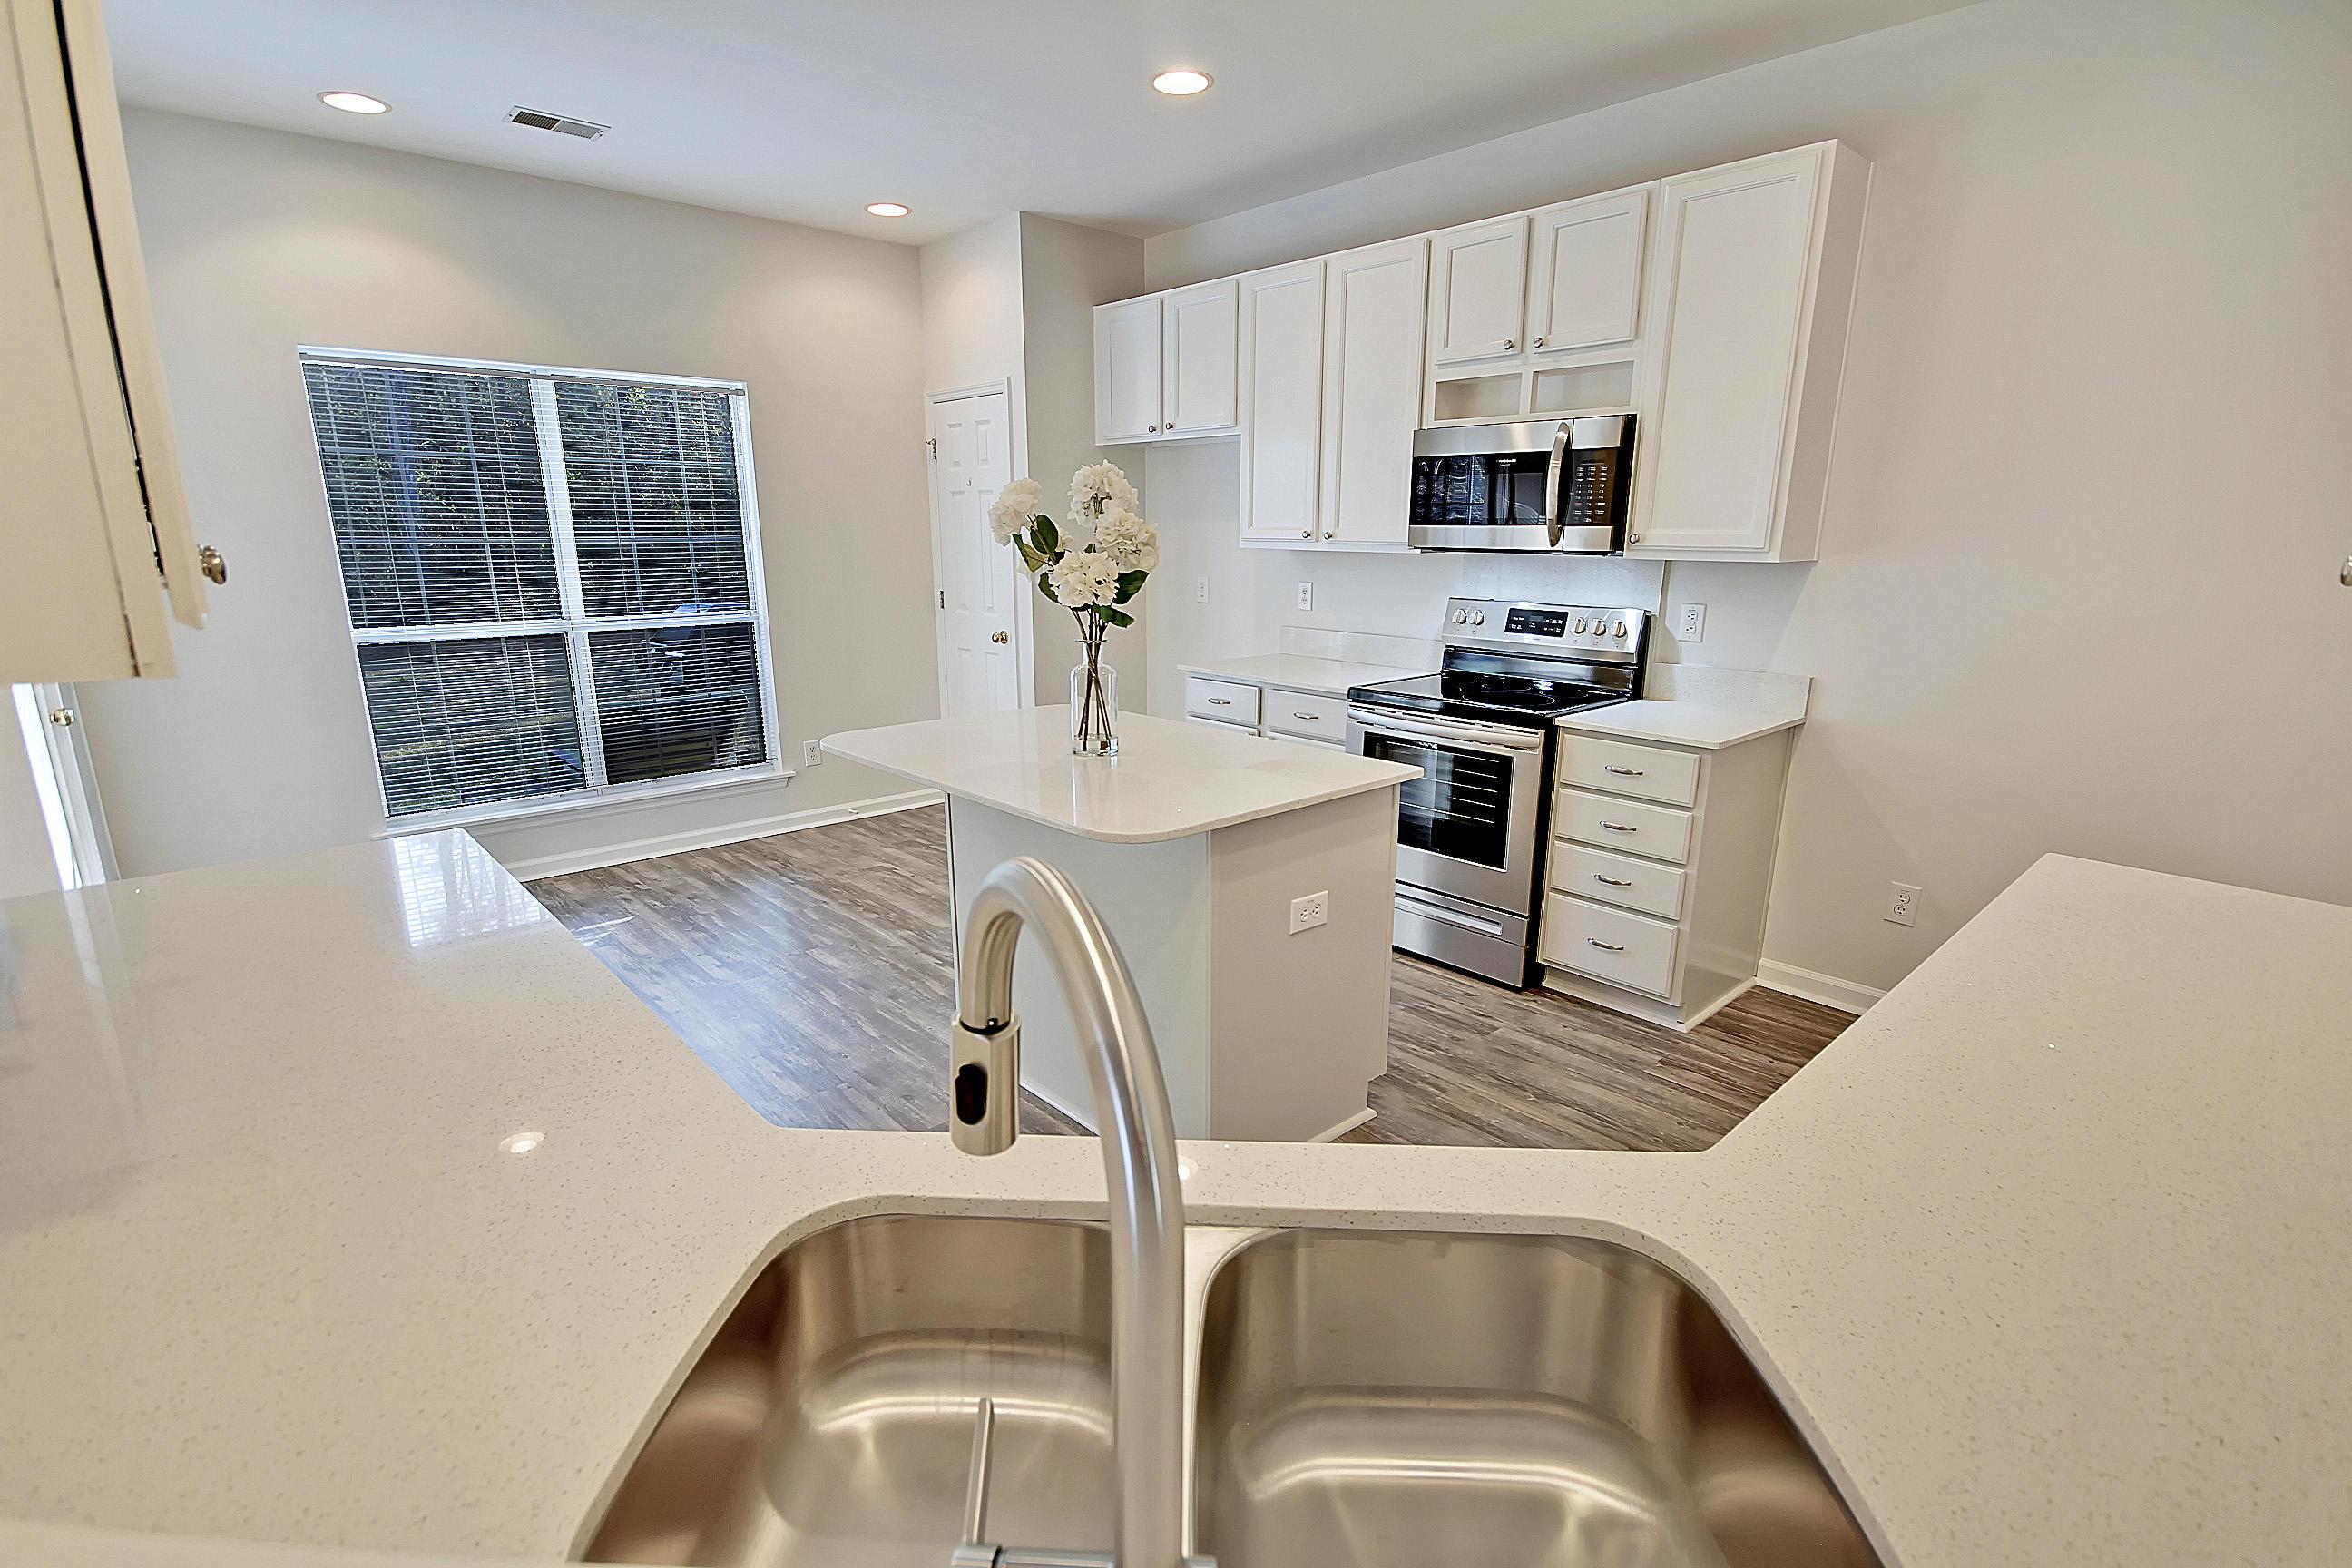 Dunes West Homes For Sale - 2656 Palmetto Hall, Mount Pleasant, SC - 3